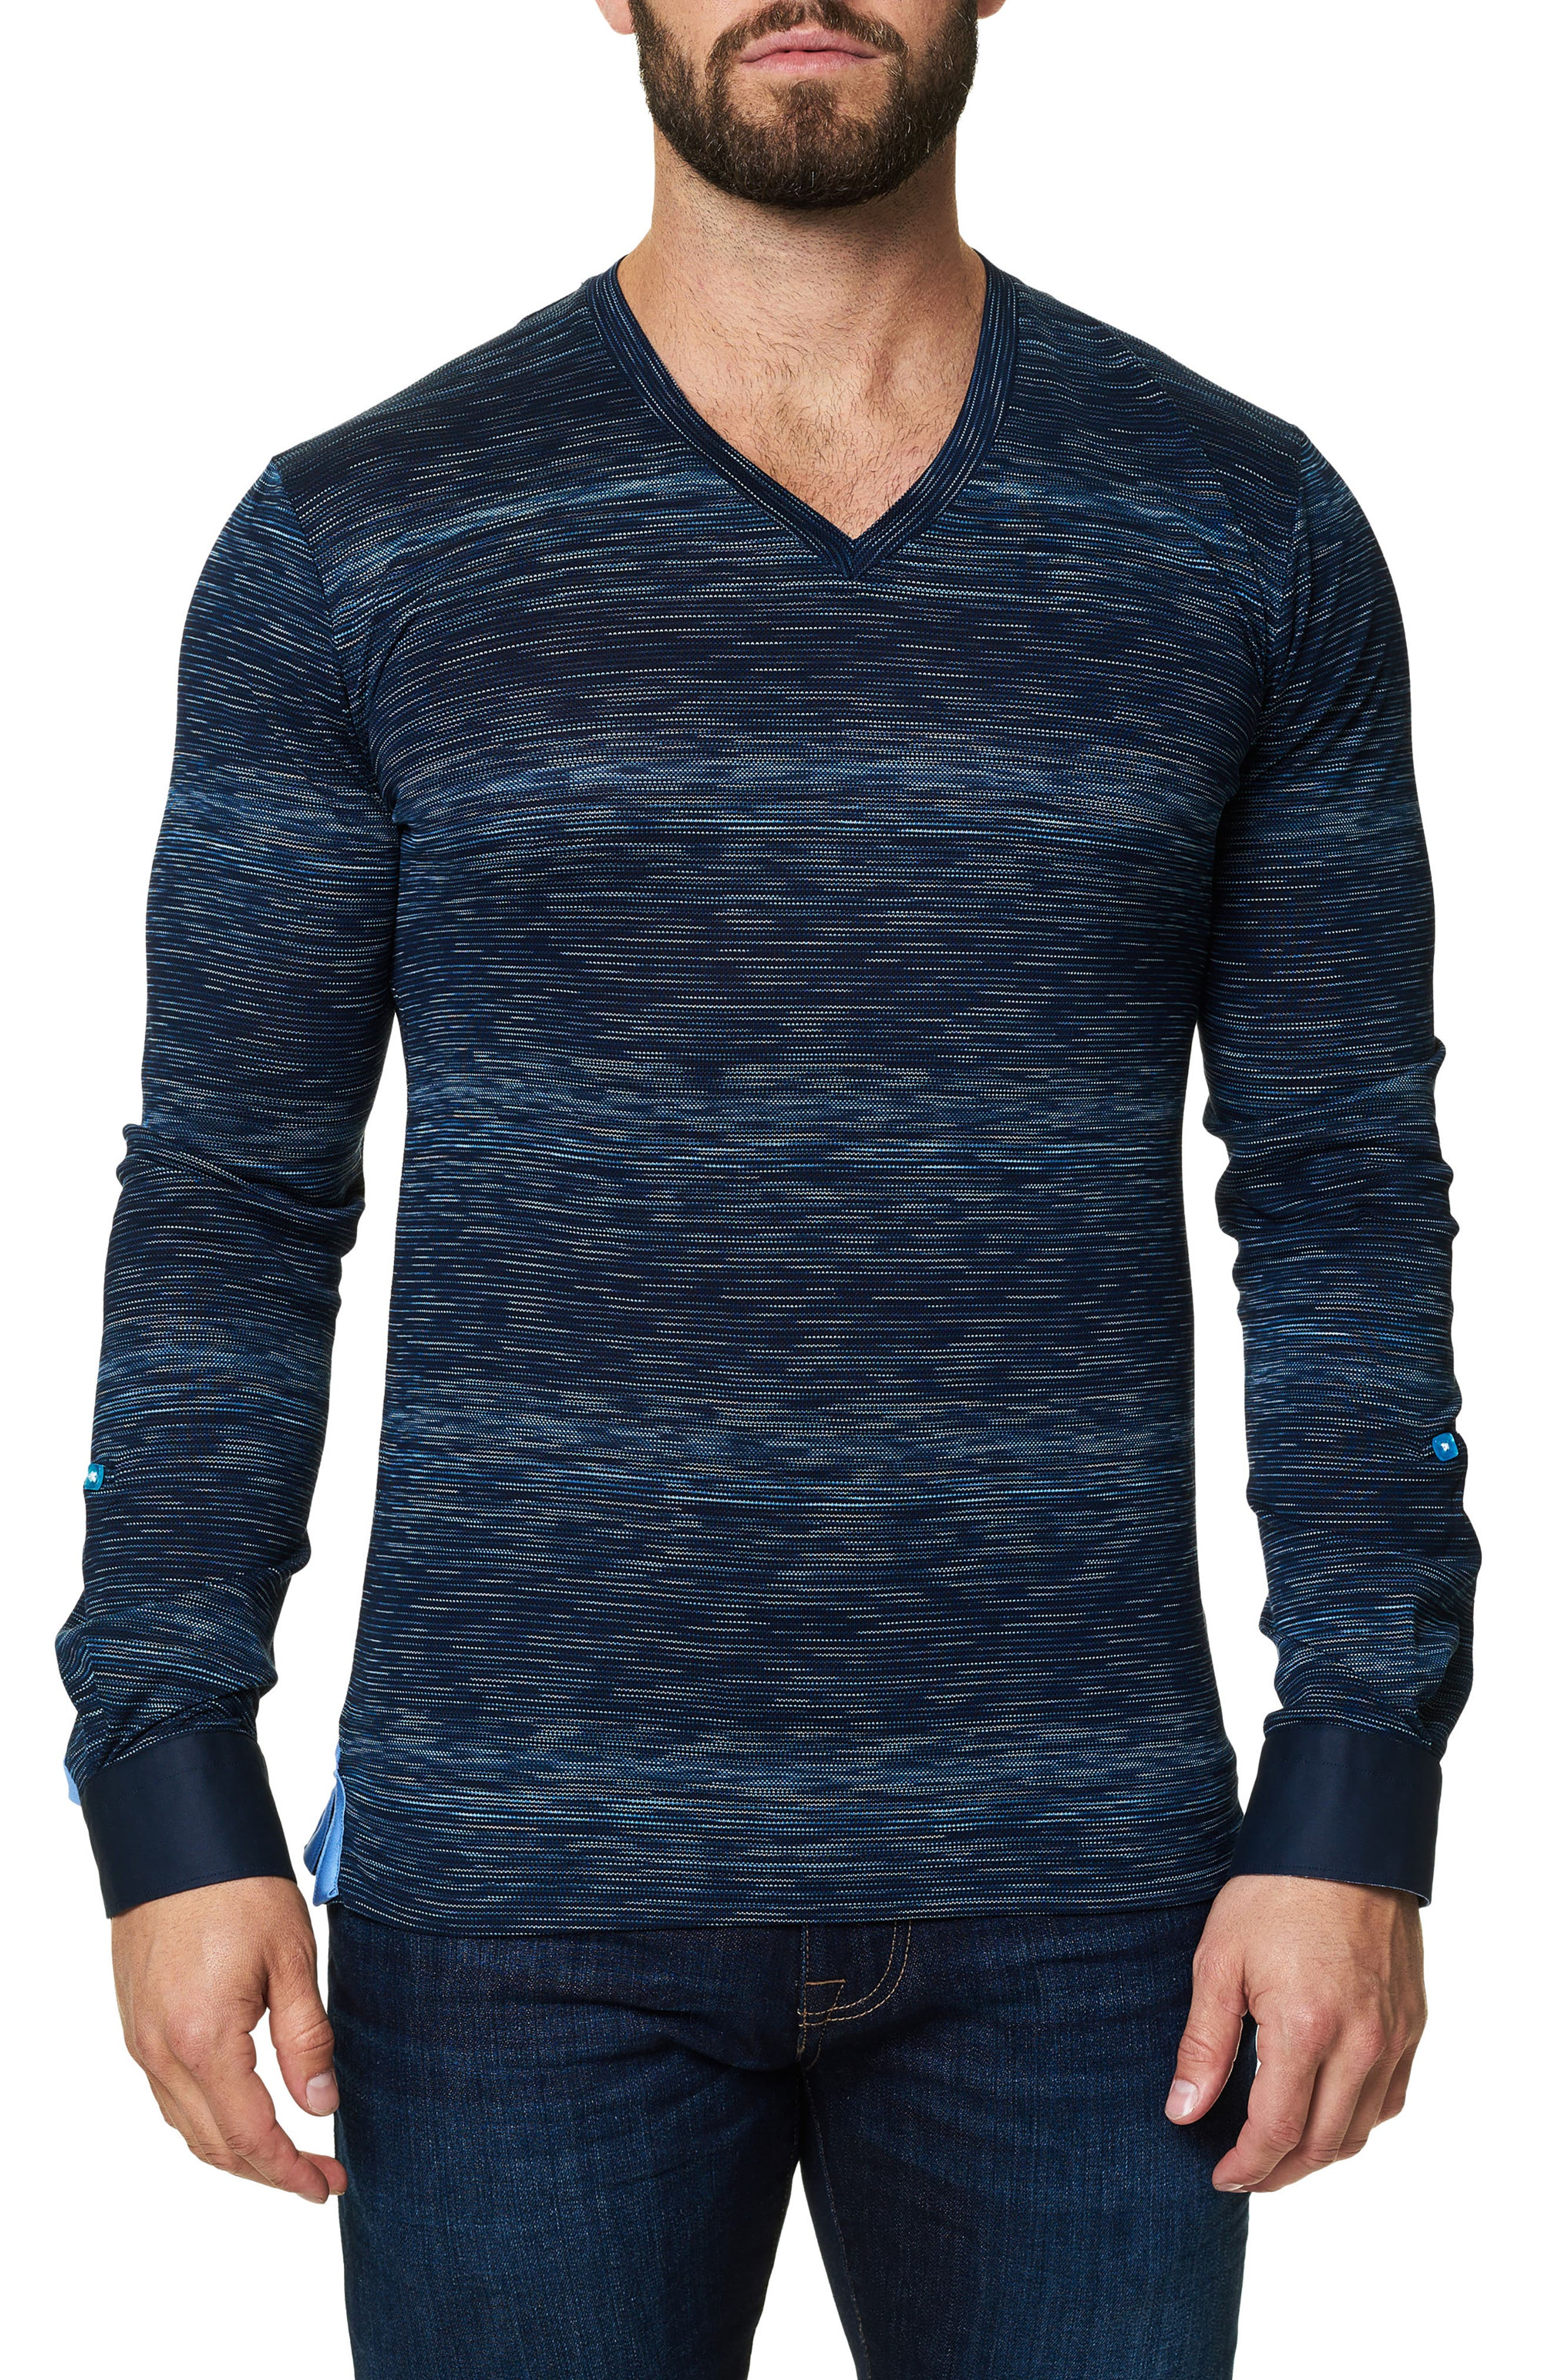 Stripe Long Sleeve V-Neck,                             Main thumbnail 1, color,                             Navy Blue